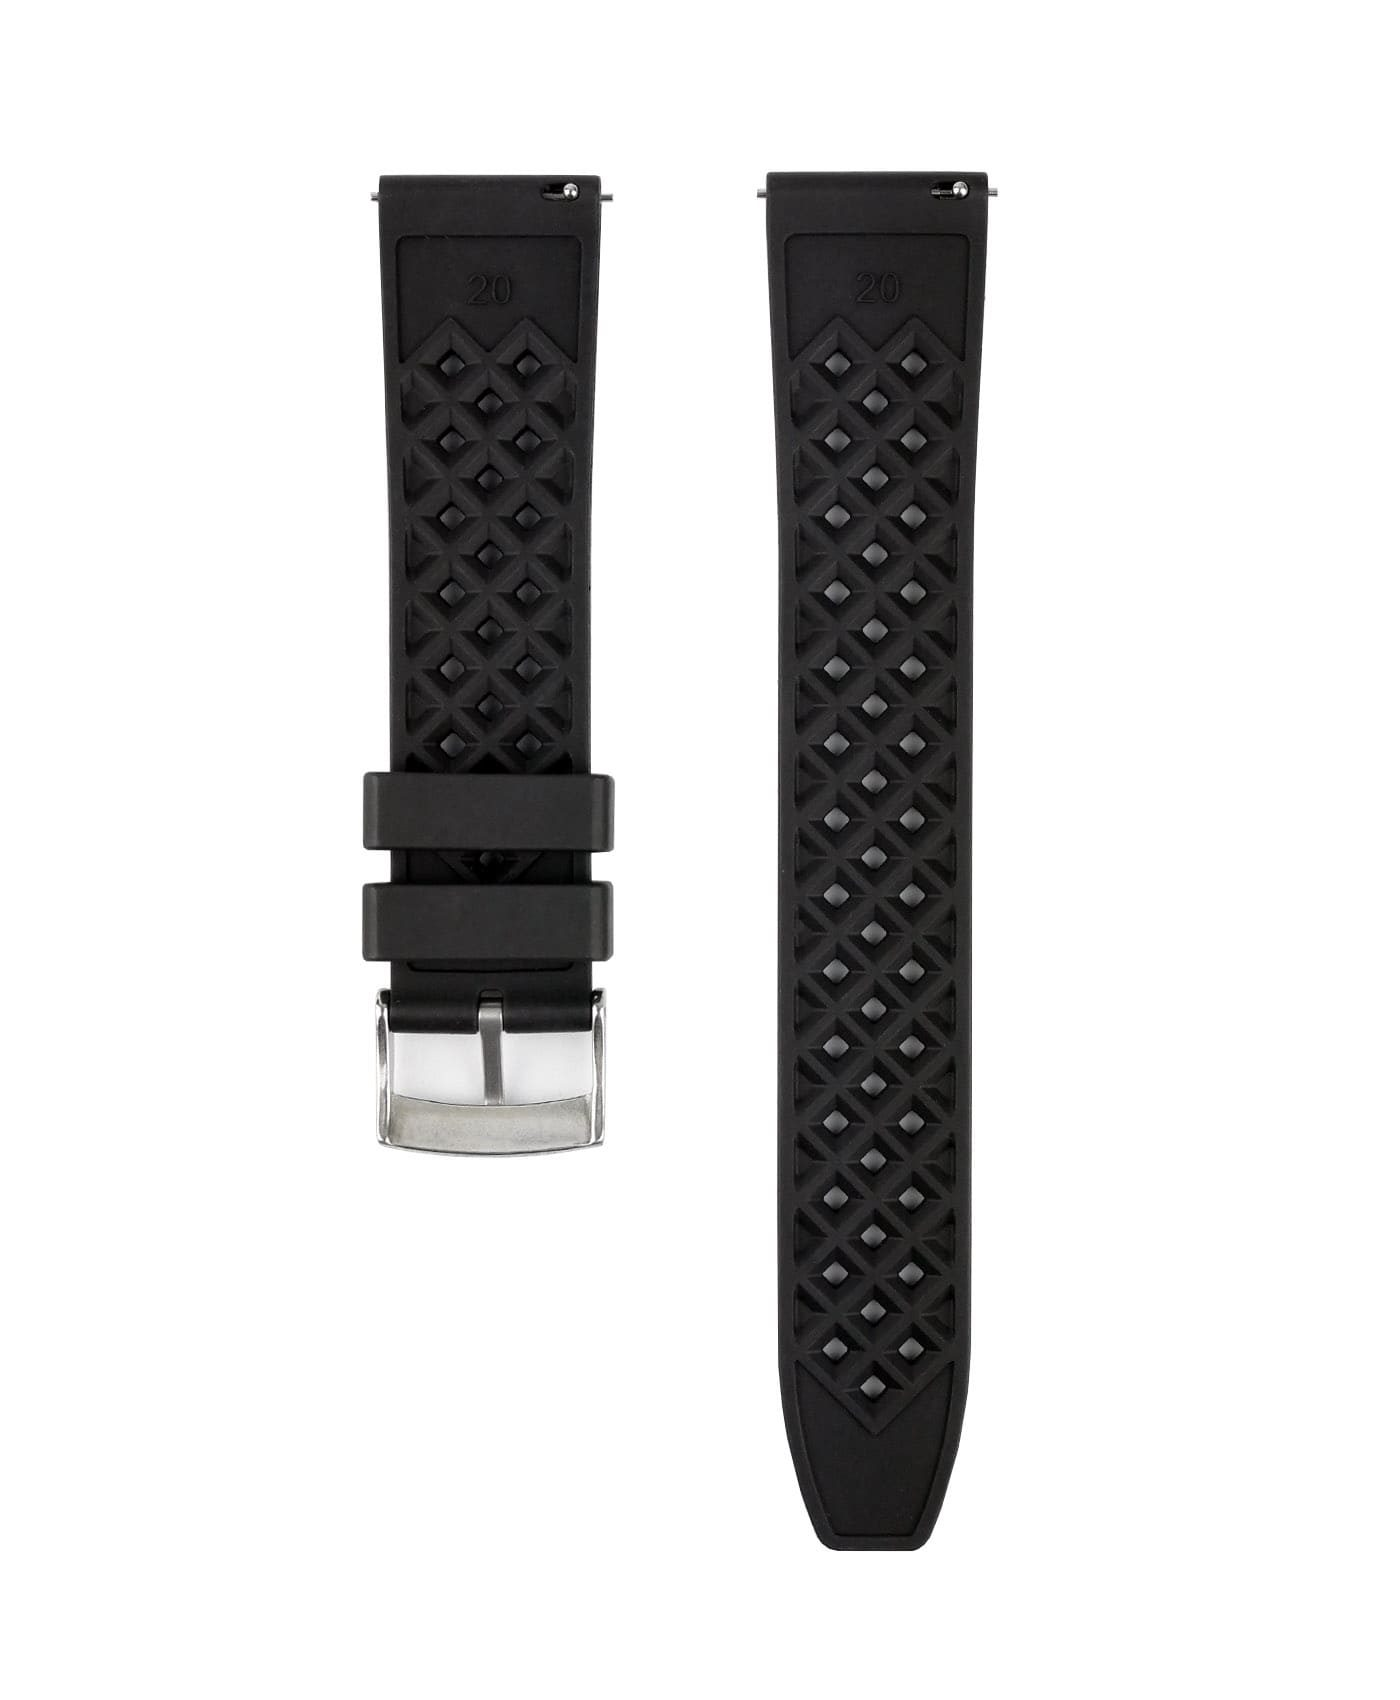 Rhombus FKM Rubber watch strap_Black_Back